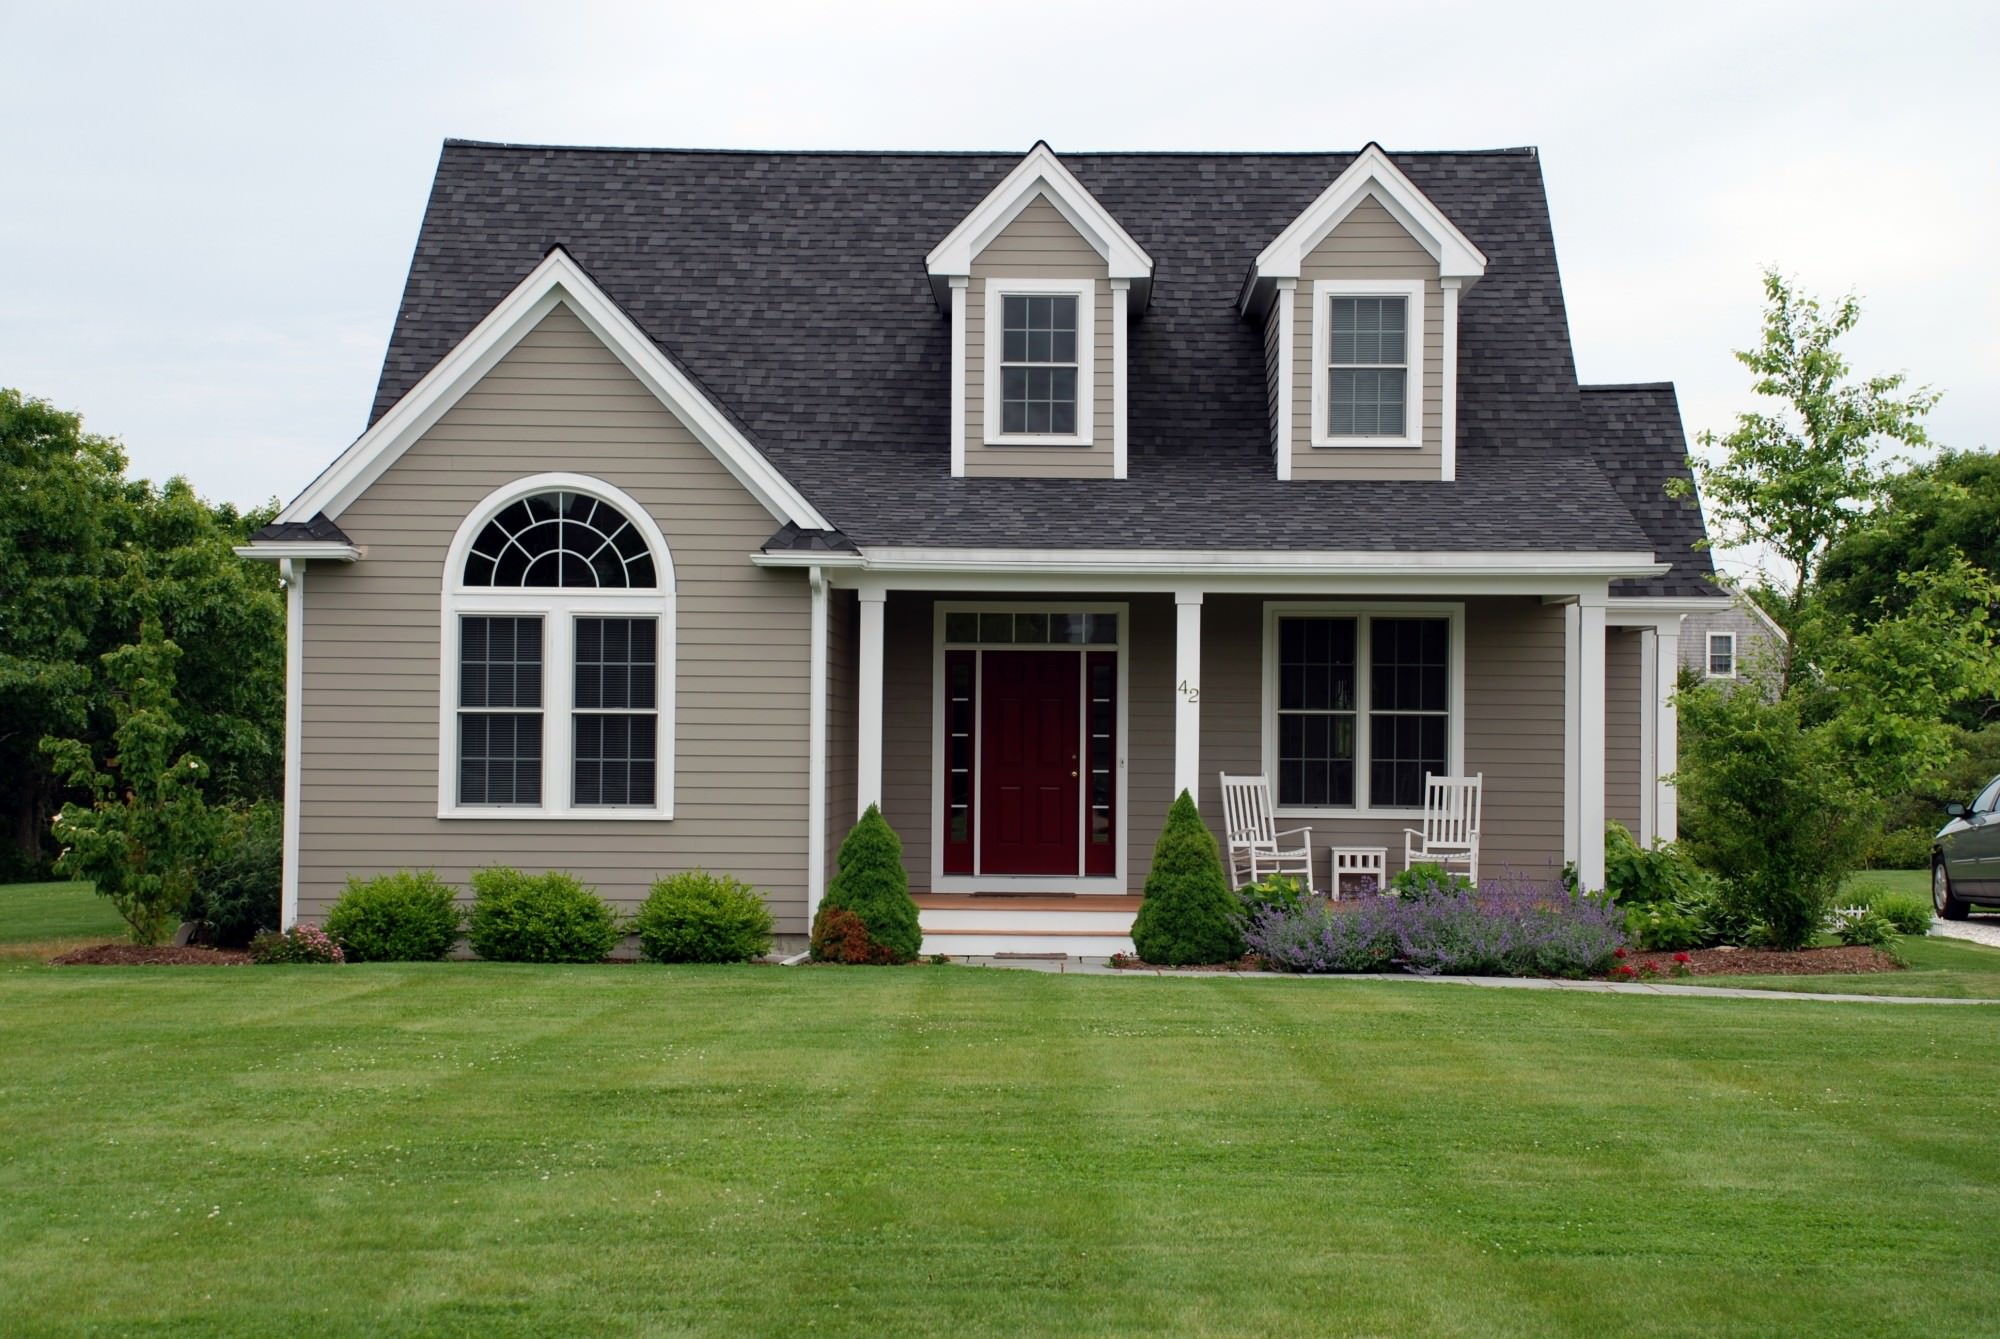 single-family-home-green-lawn-e1416364696956-1